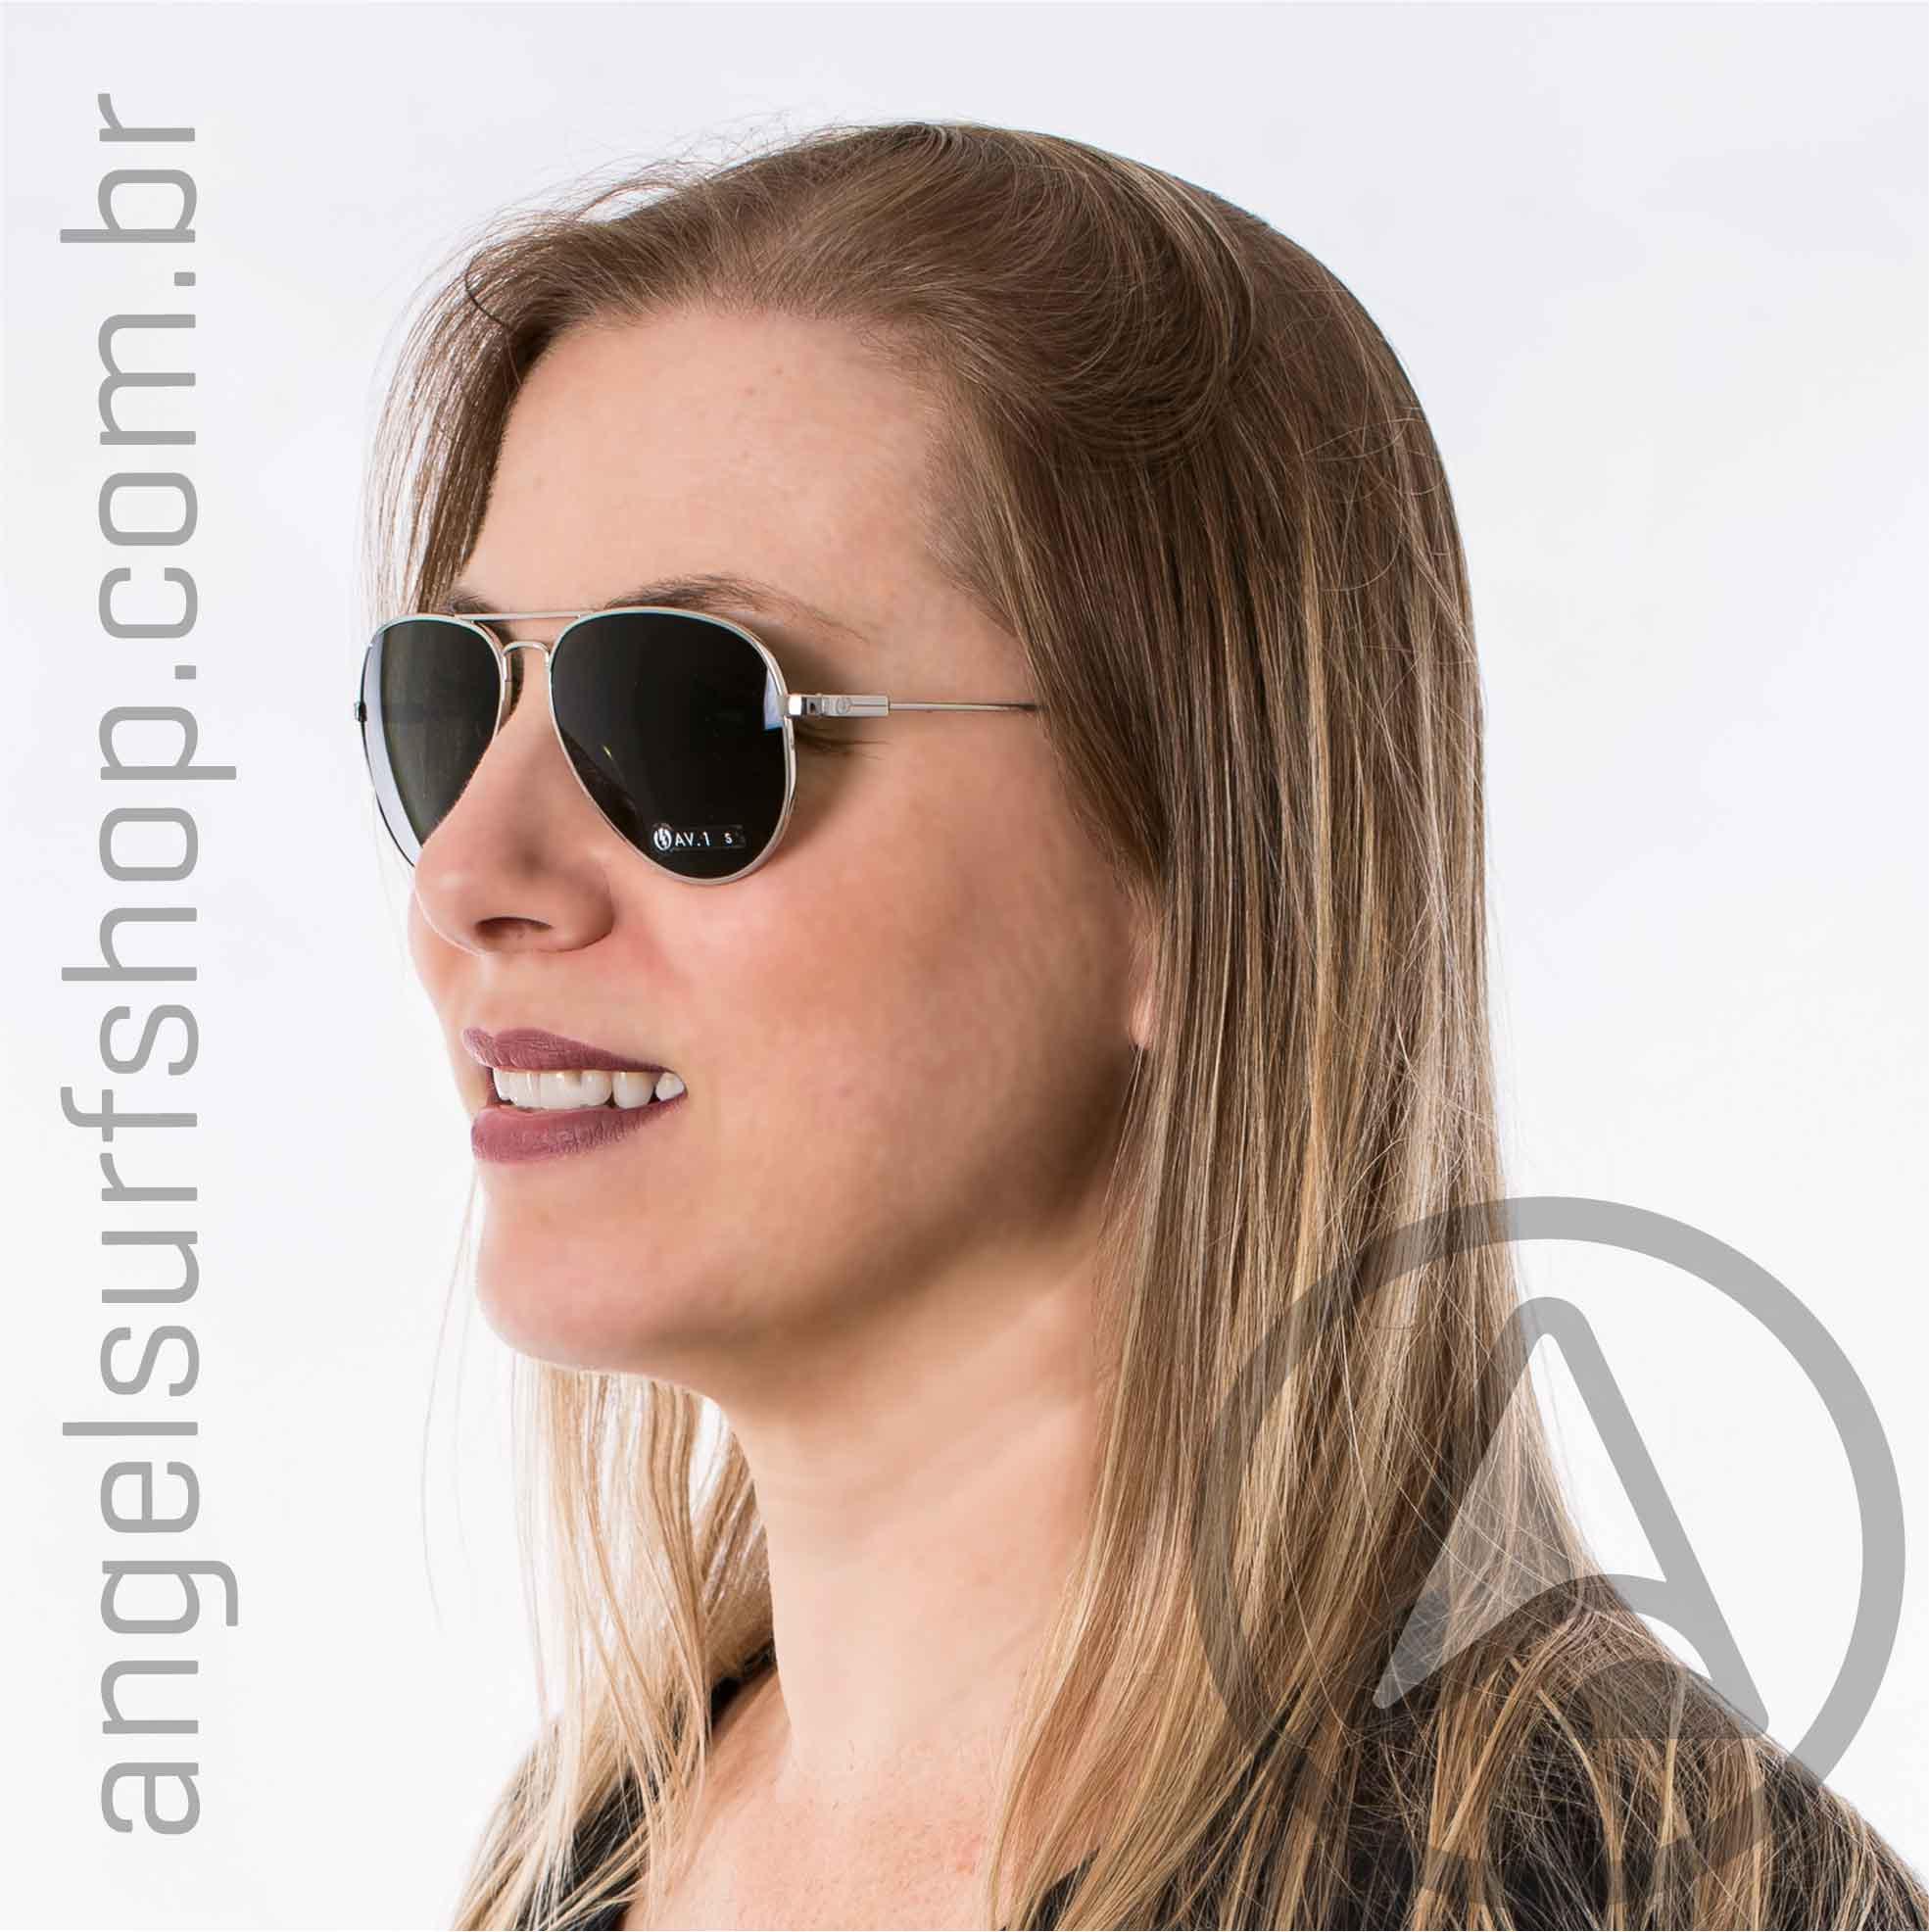 Sunglass Electric AV1 Small Platinum M Grey (UNISSEX)